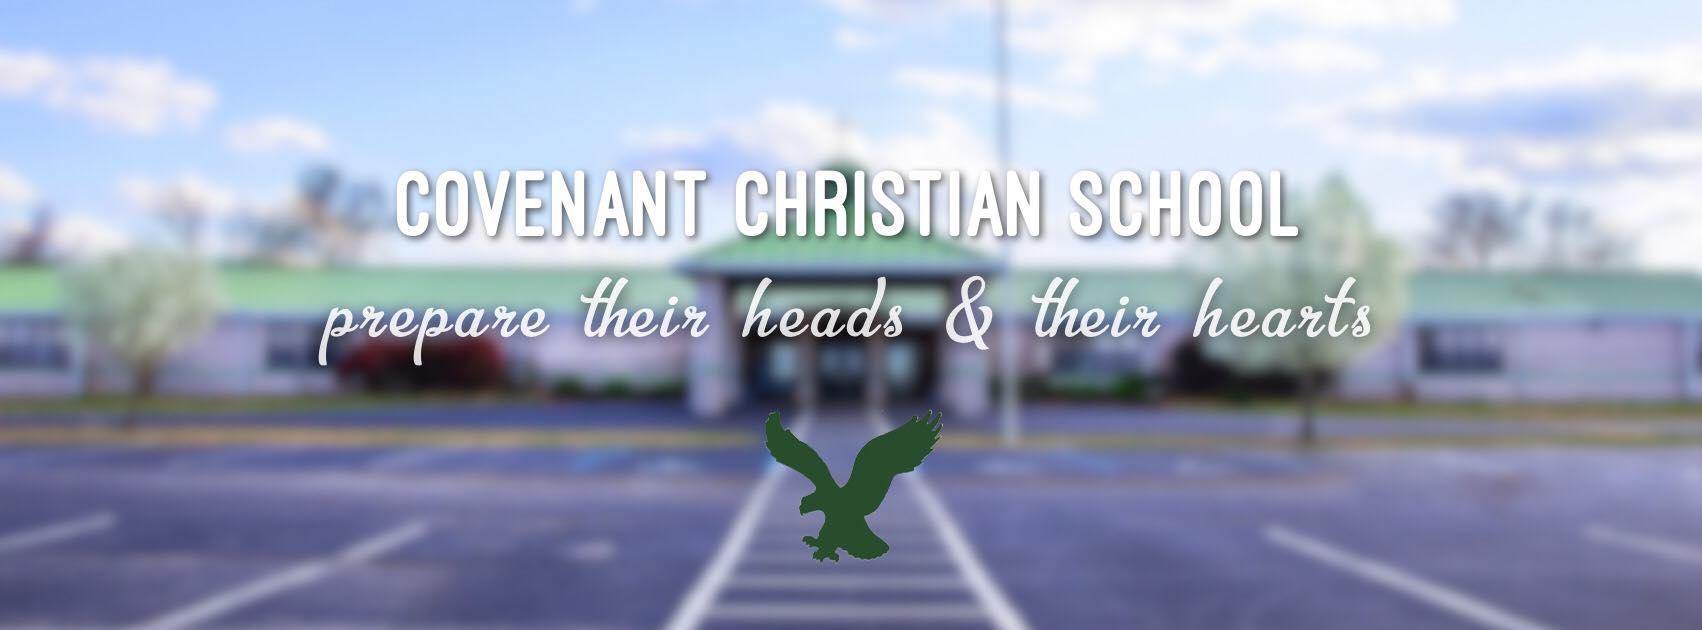 Covenant Christian School